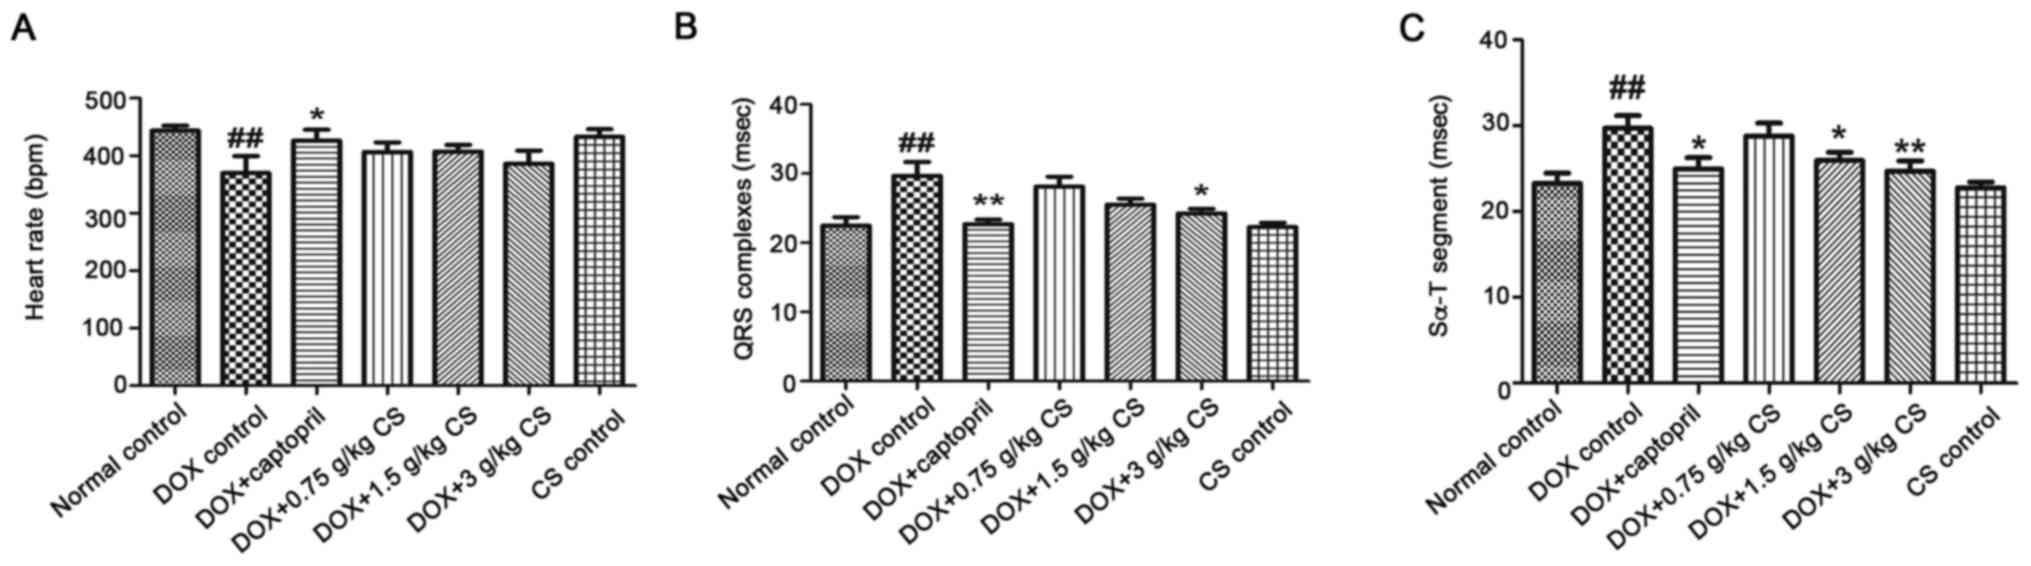 Effect of fermented Cordyceps sinensis on doxorubicin